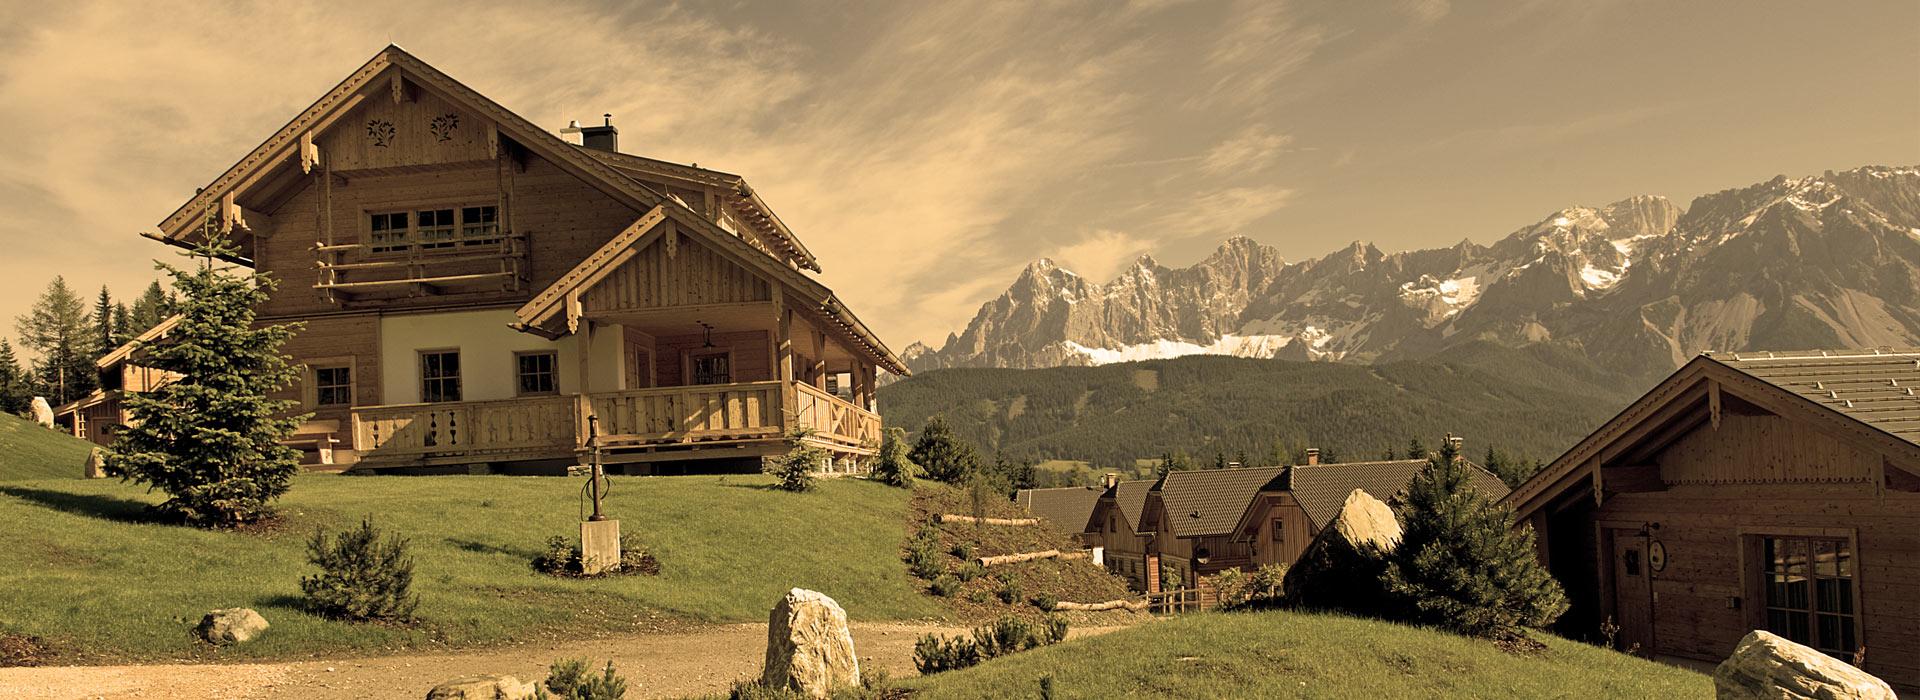 Almdorf австрия